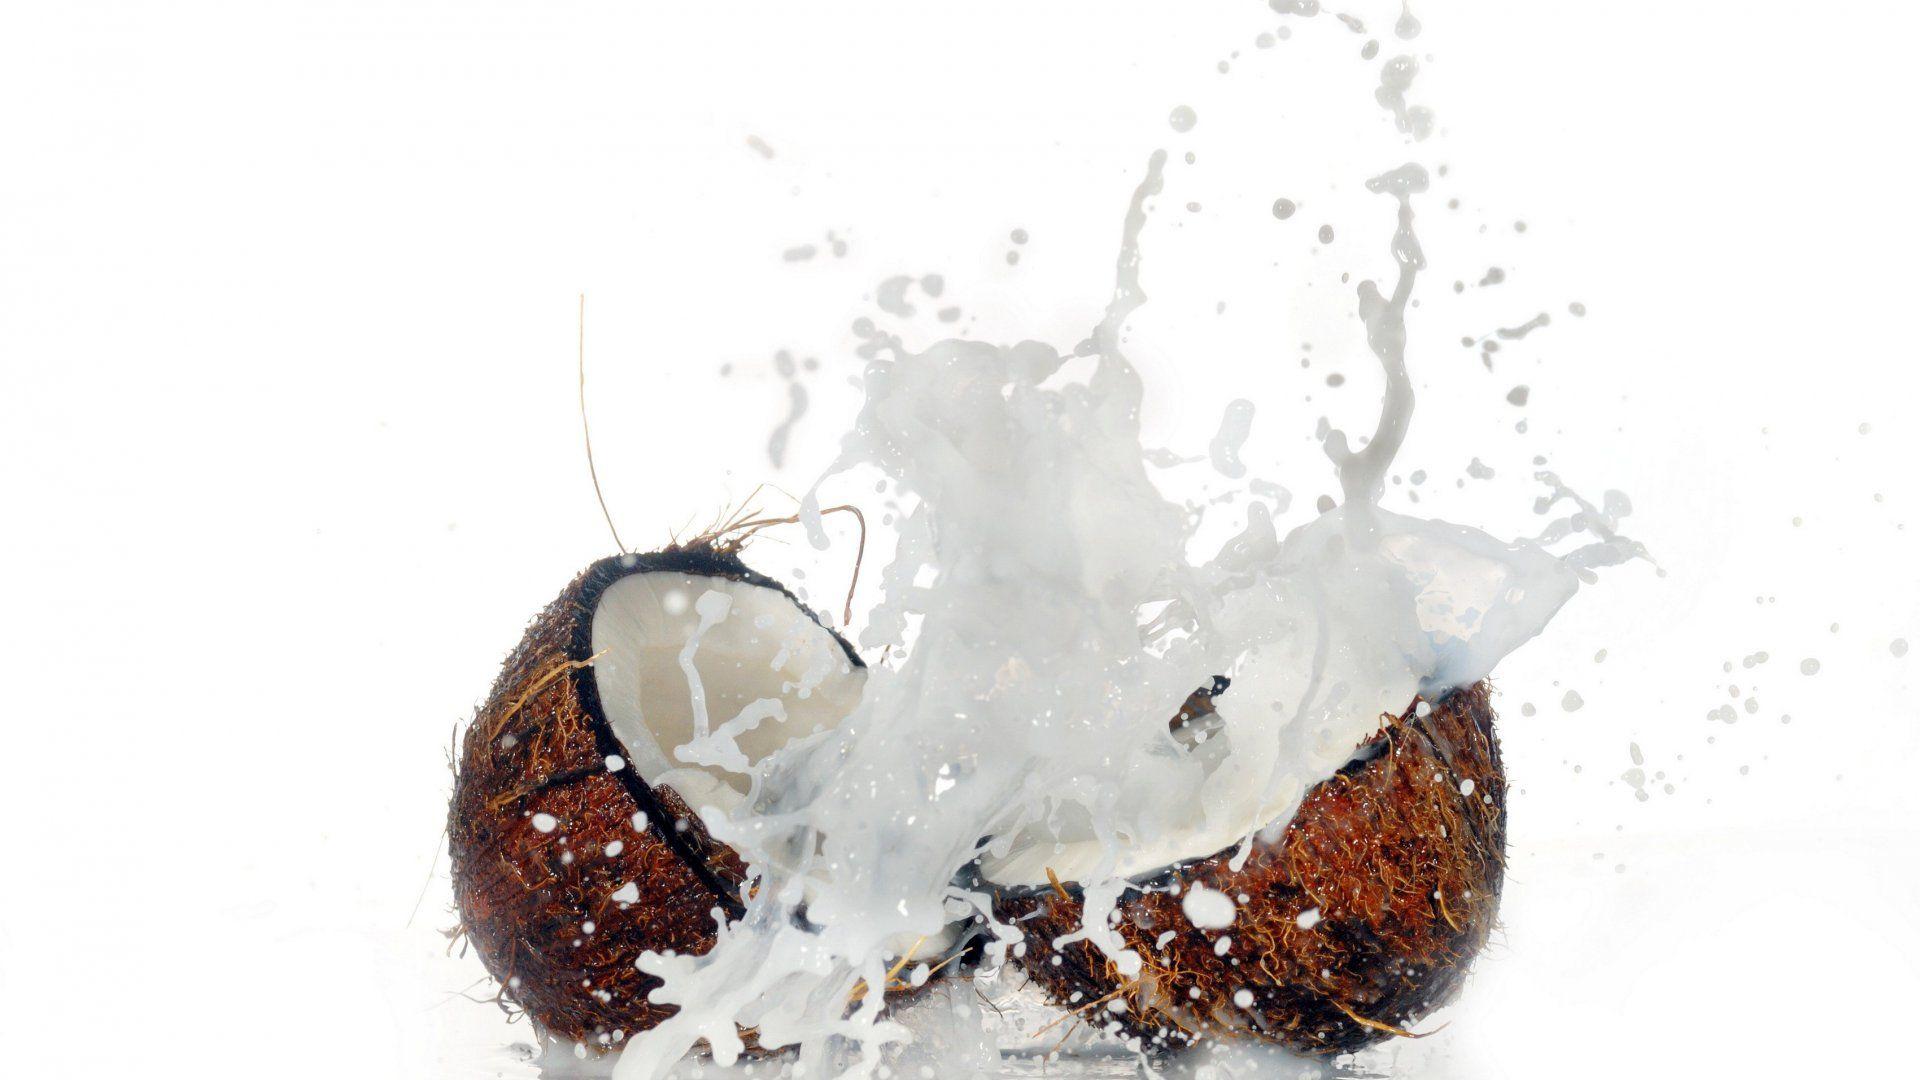 Coconut splash hd wallpaper 2021 live wallpaper hd